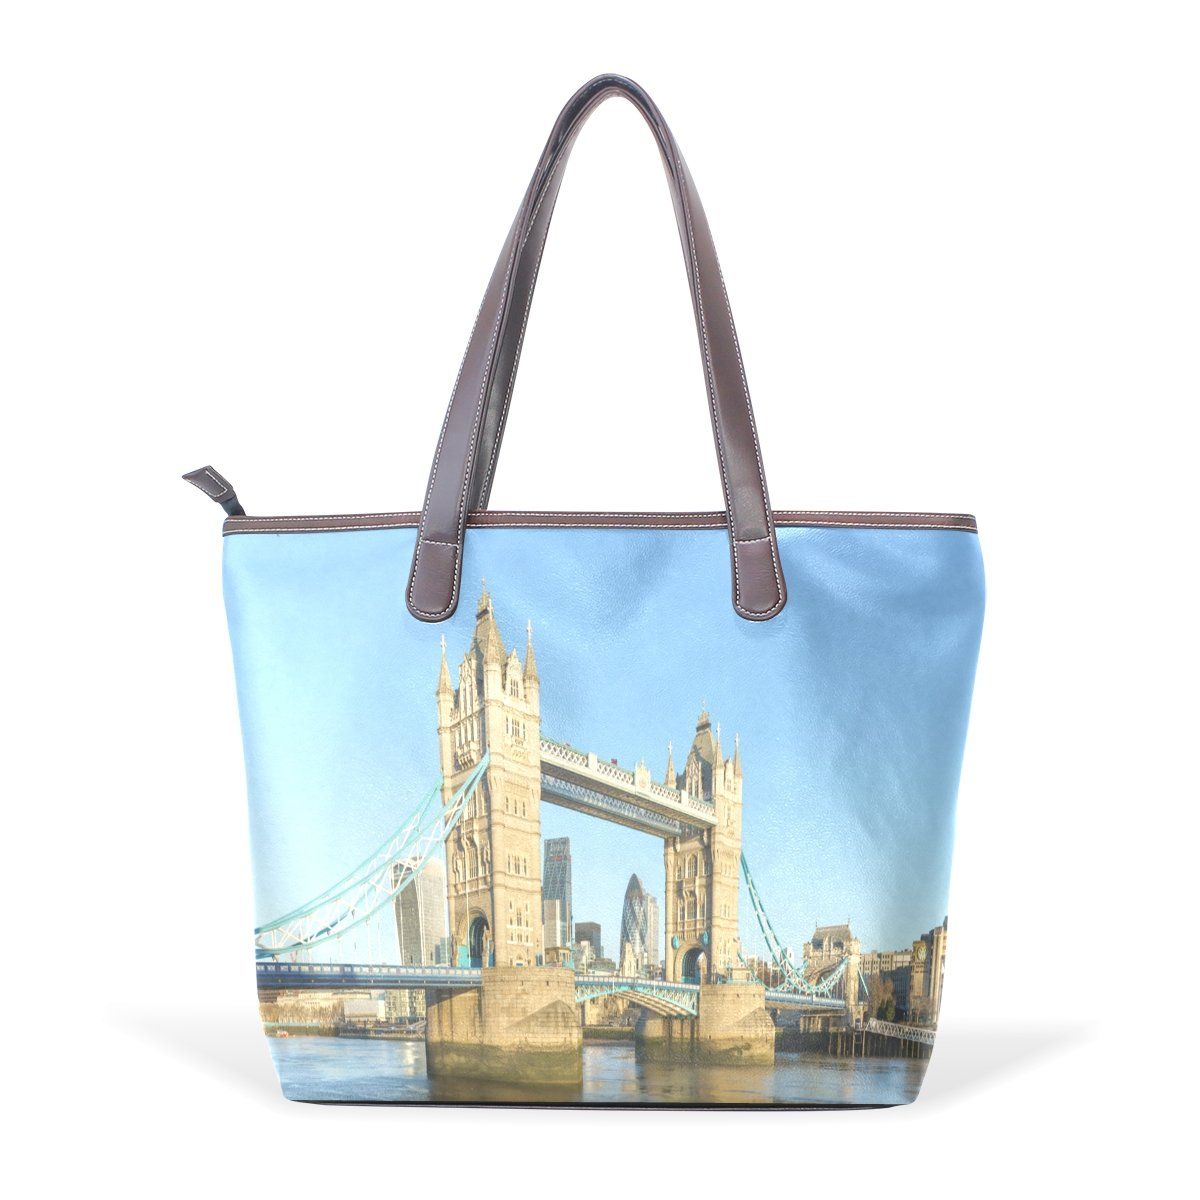 Mr.Weng Household London Bridge Lady Handbag Tote Bag Zipper Shoulder Bag